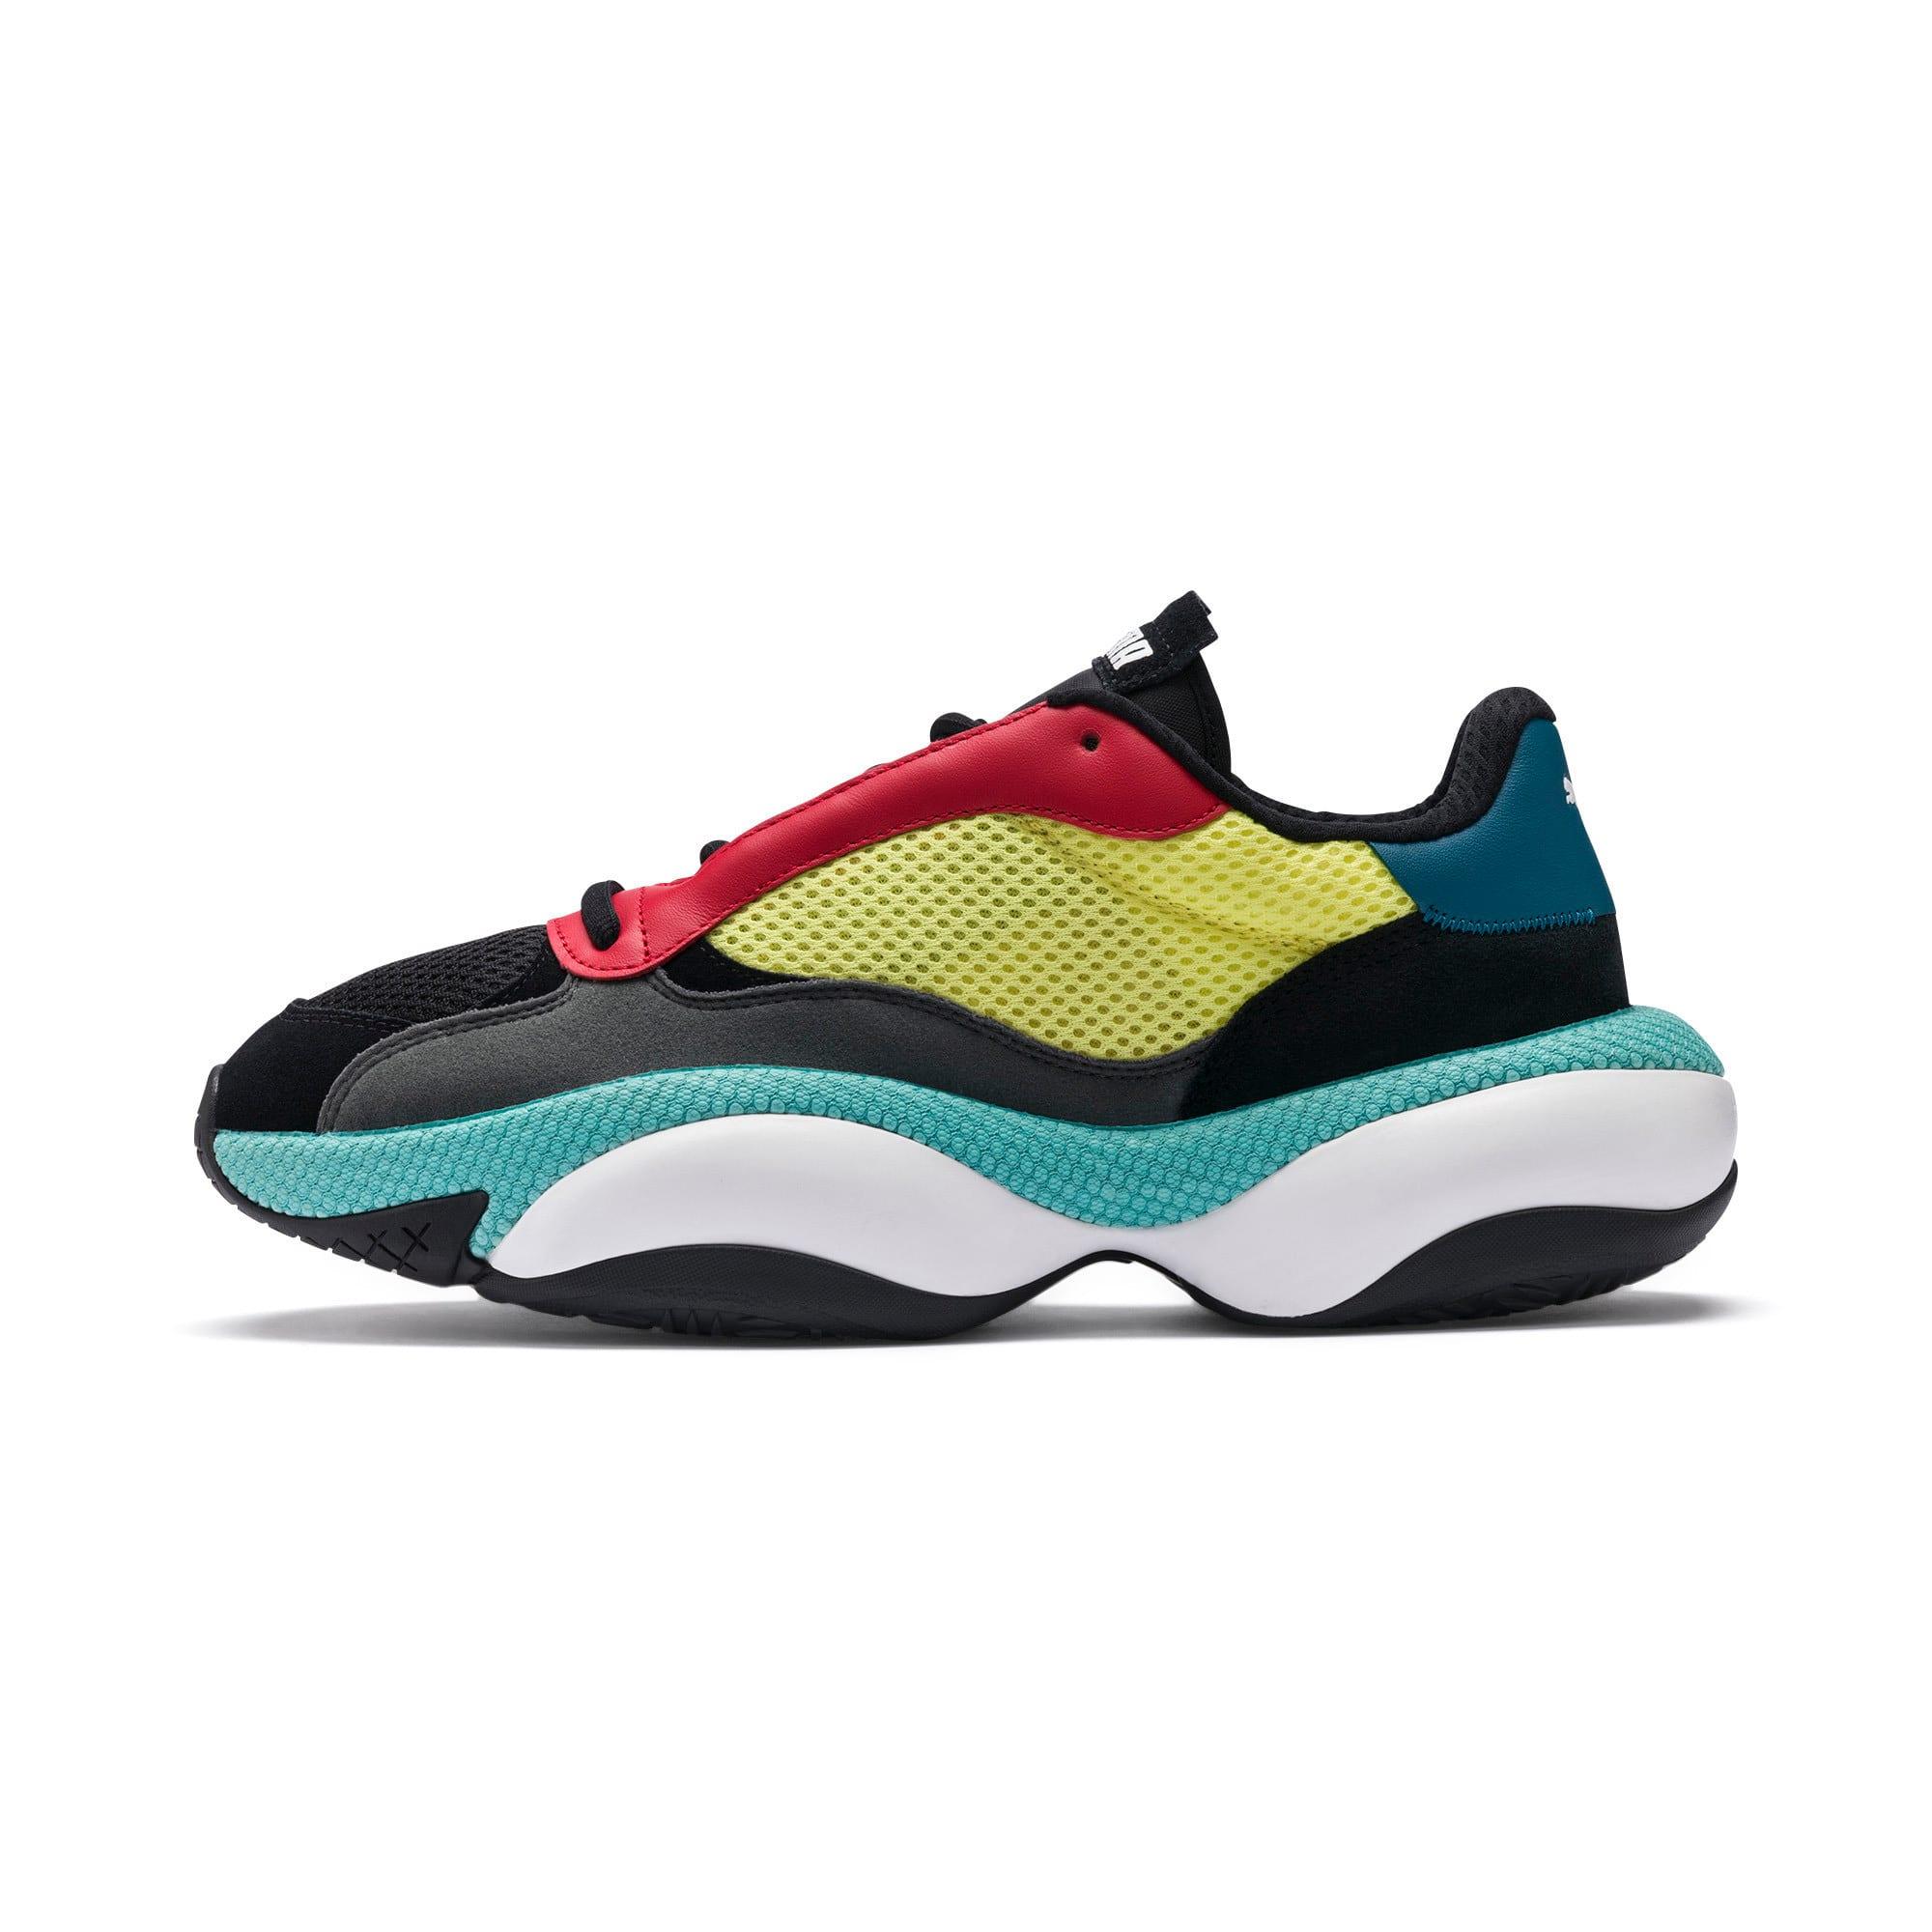 Thumbnail 1 of Alteration Kurve Sneakers, Puma Black-Limelight, medium